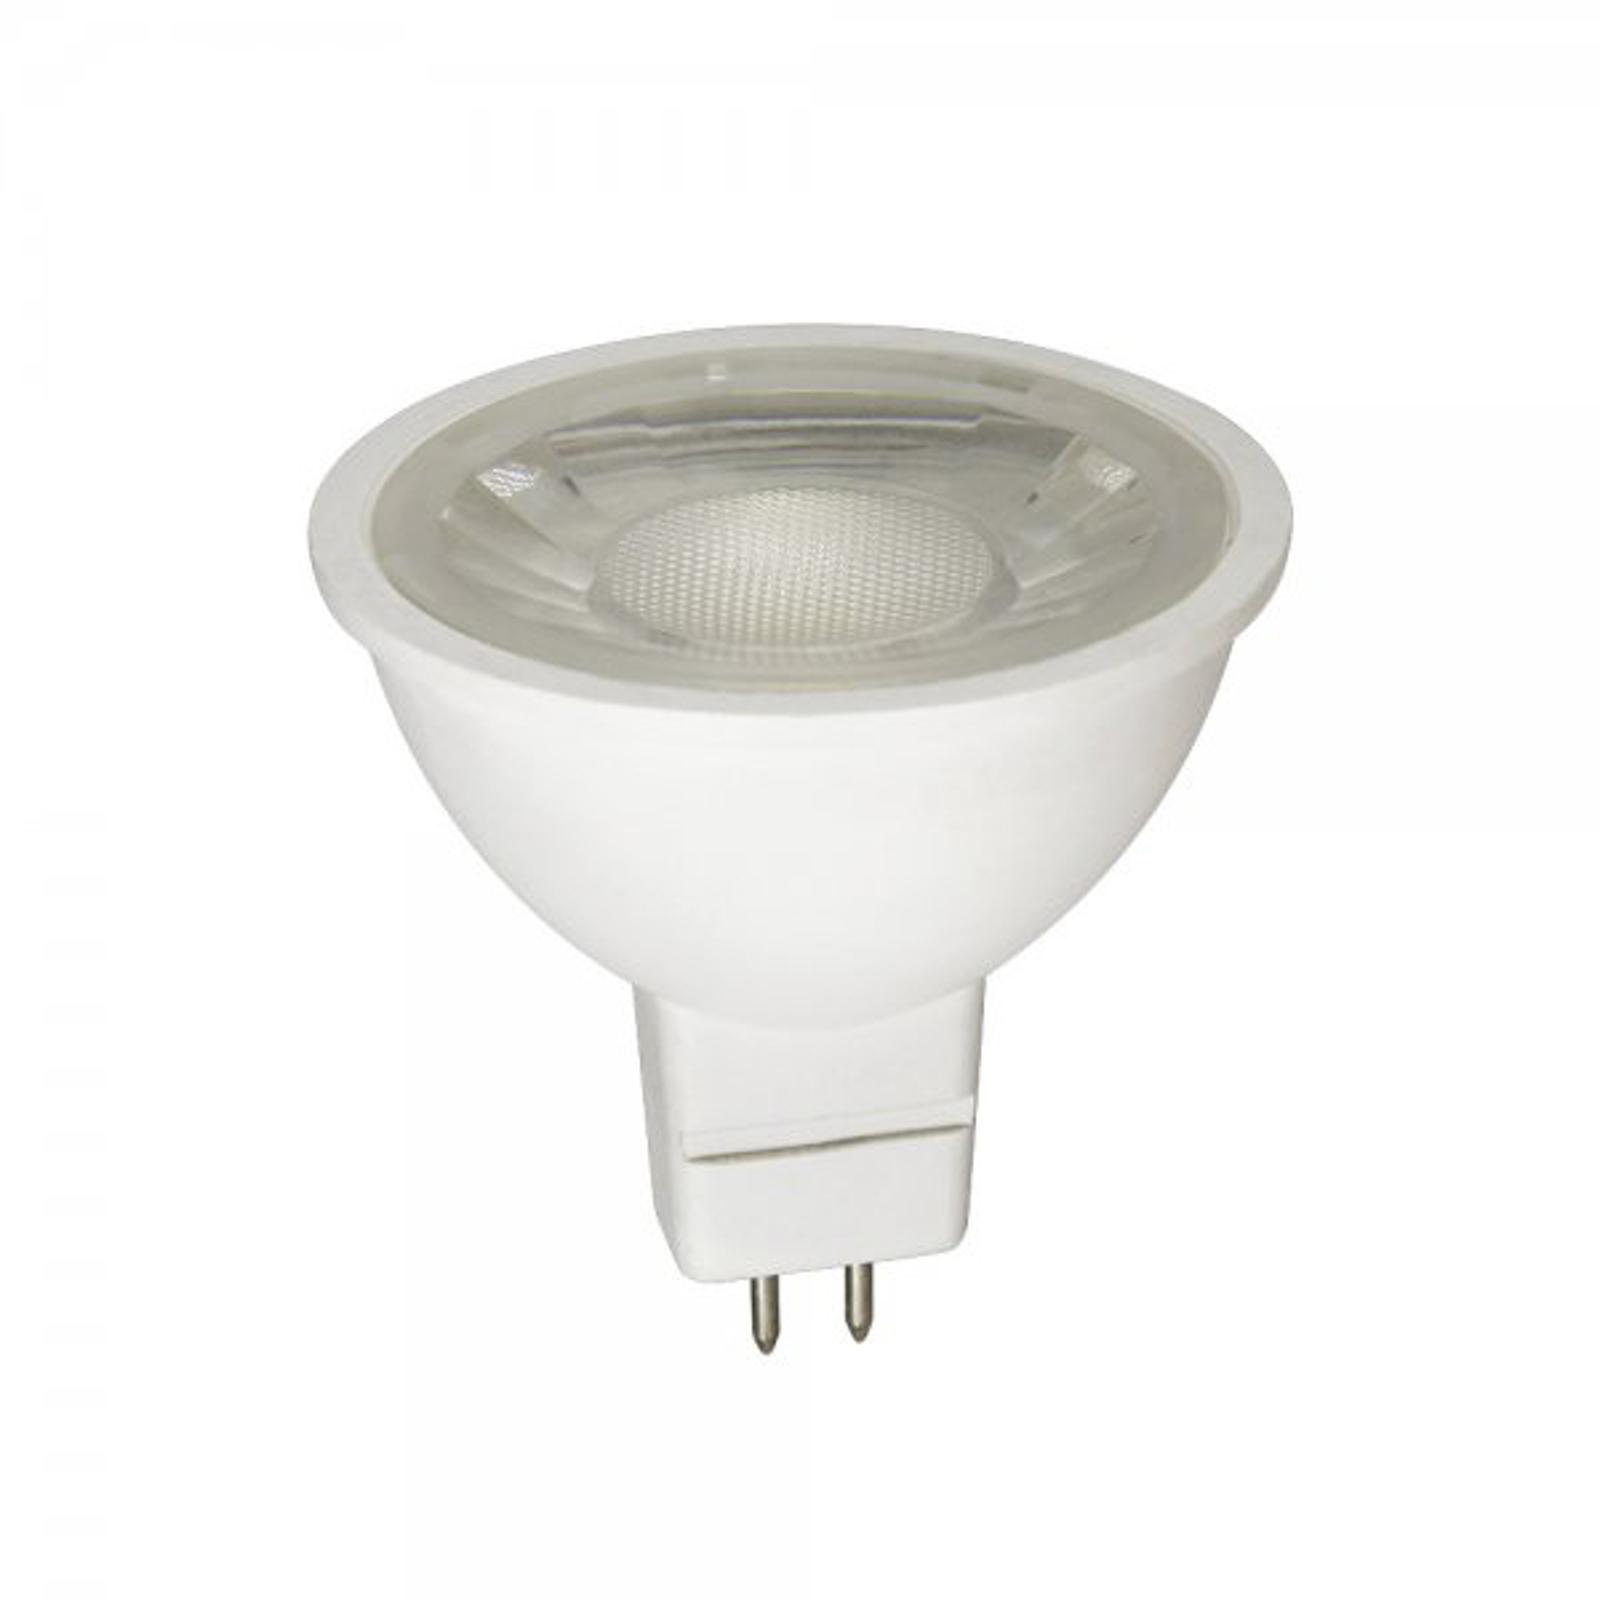 GU5.3 MR16 6W 830 HELSO LED reflector lamp_2515056_1